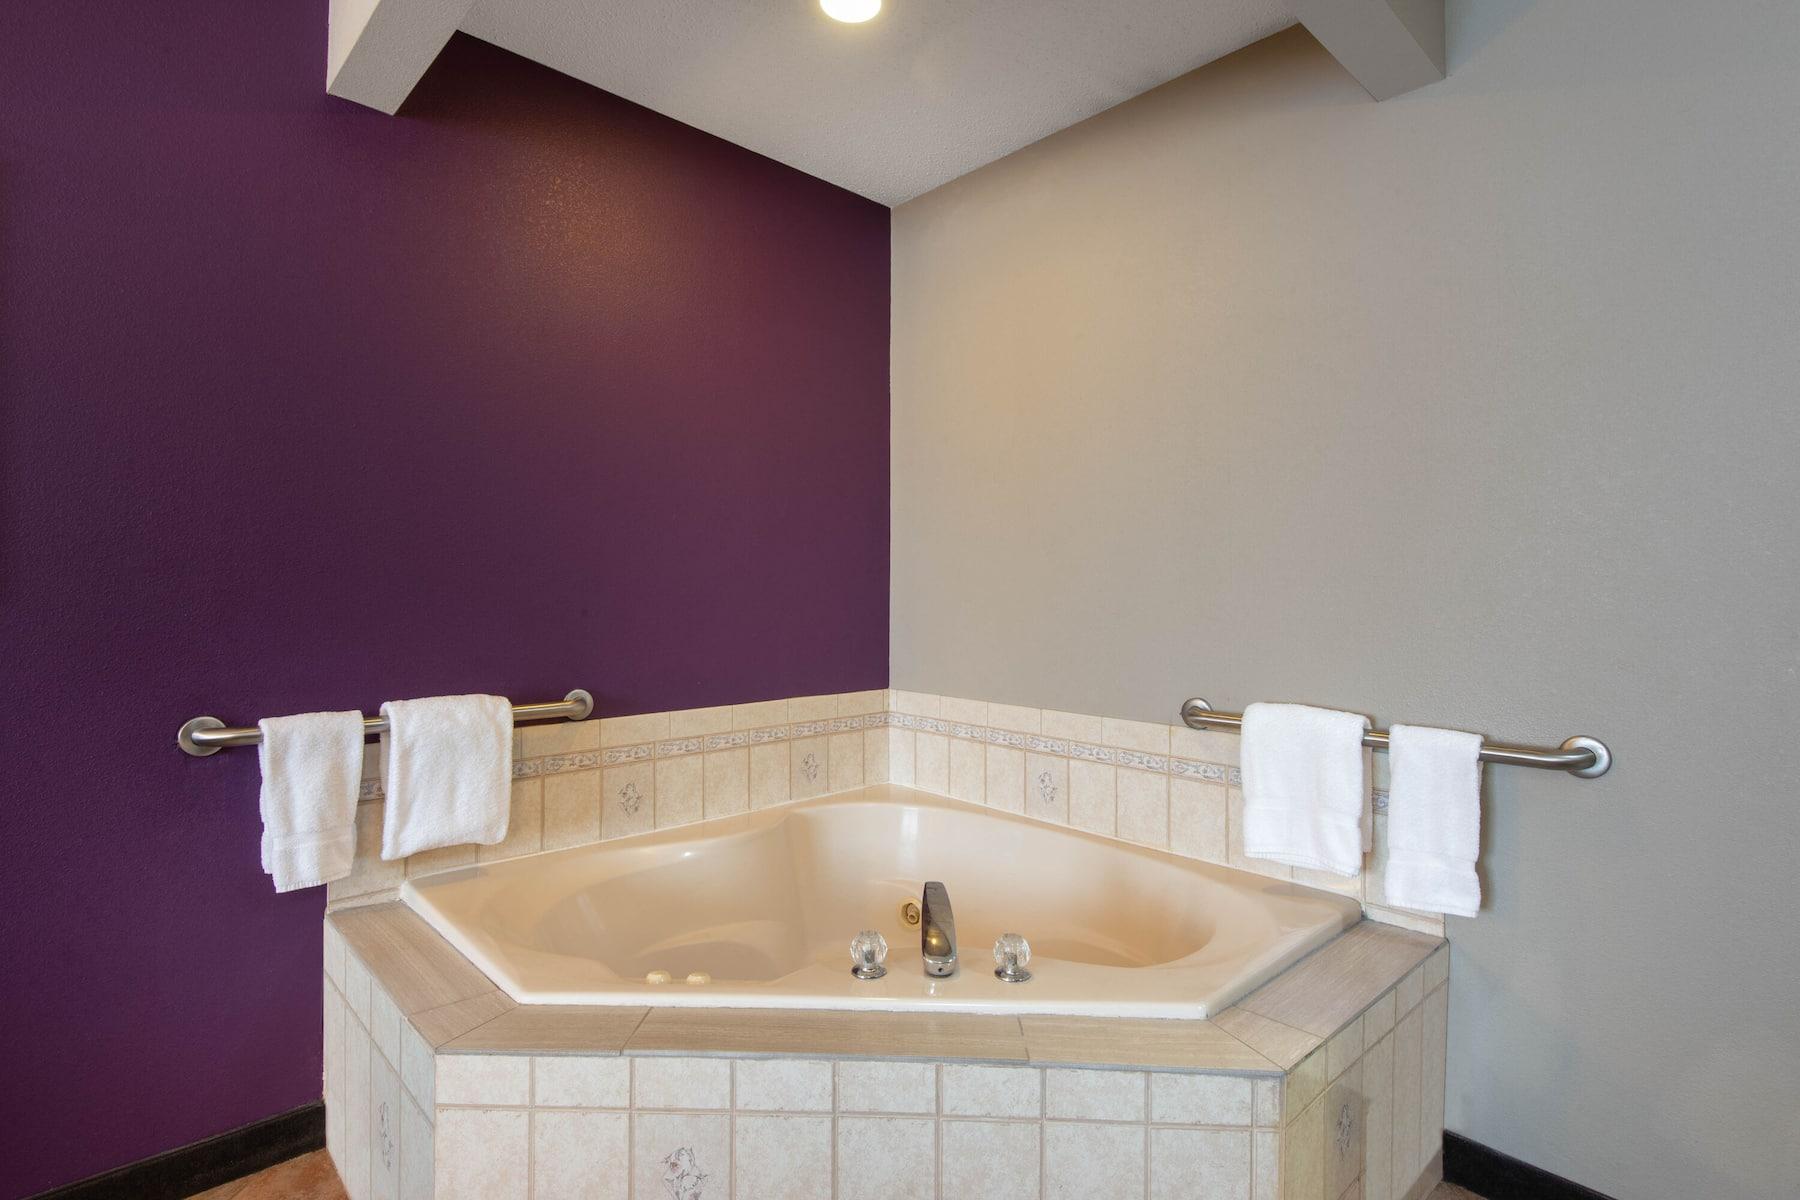 La Quinta Inn Amp Suites By Wyndham Erie Erie Pa Hotels